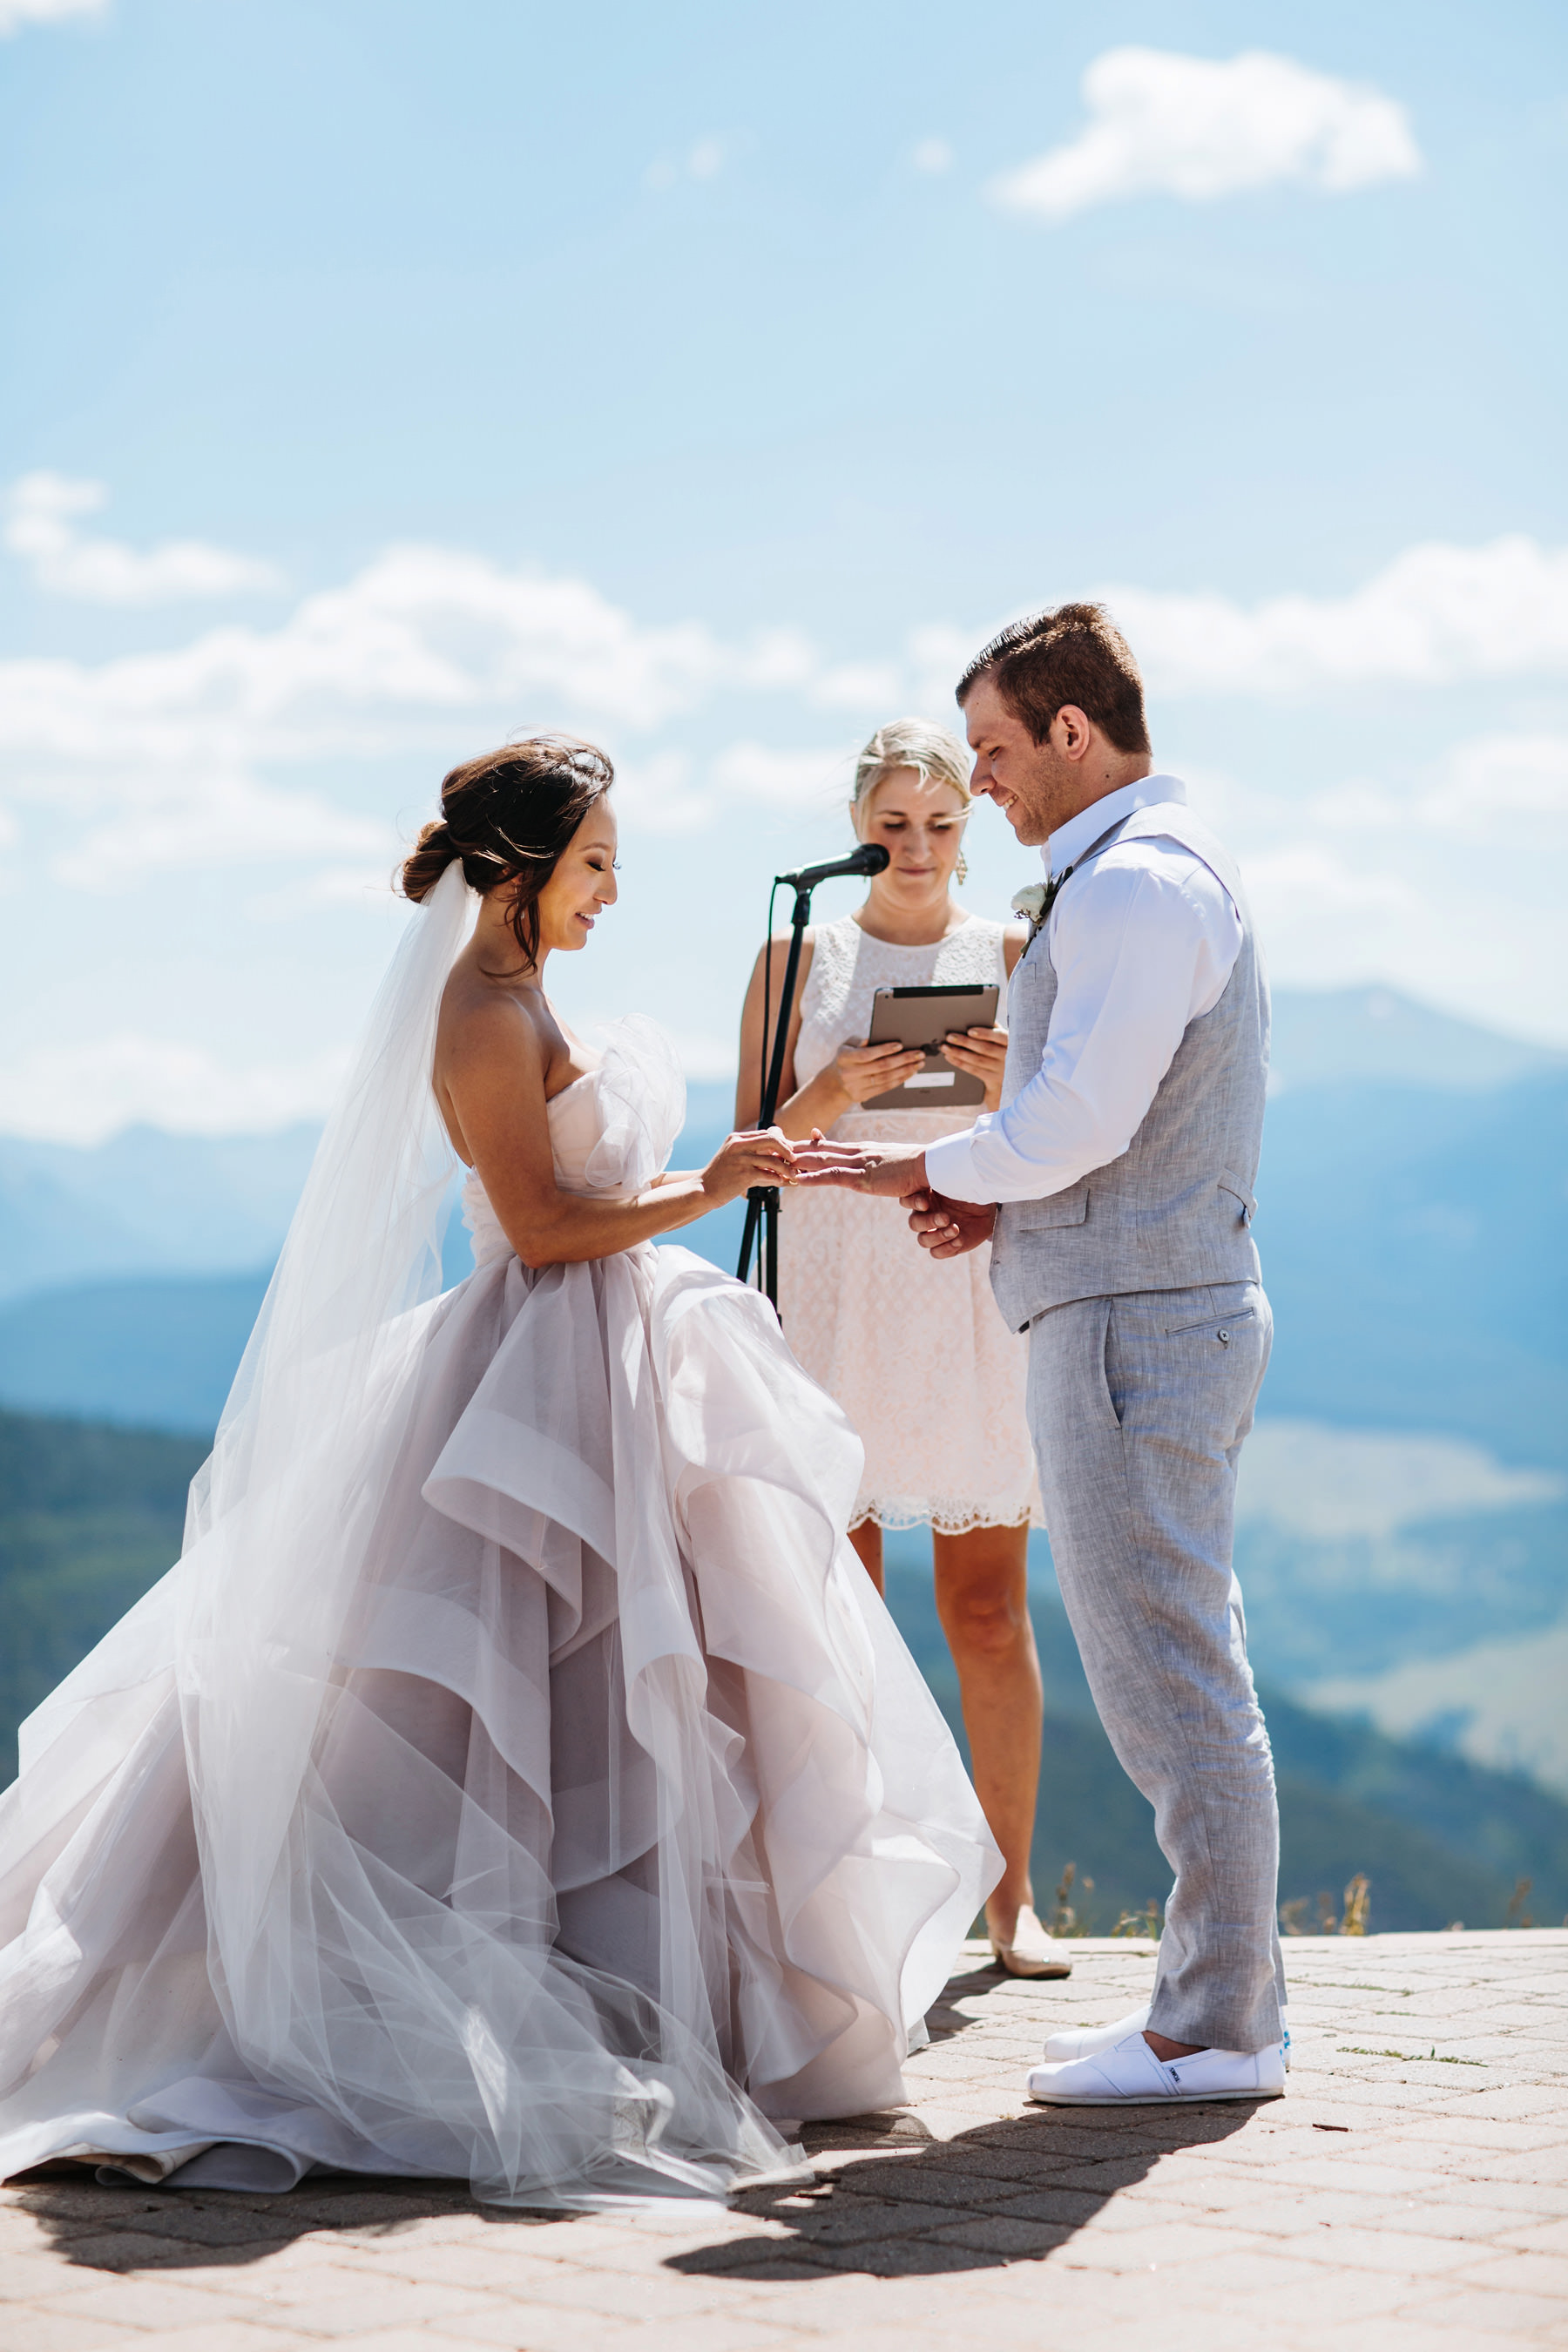 Vail Colorado Wedding Deck_ Kindling Wedding Photography36.JPG